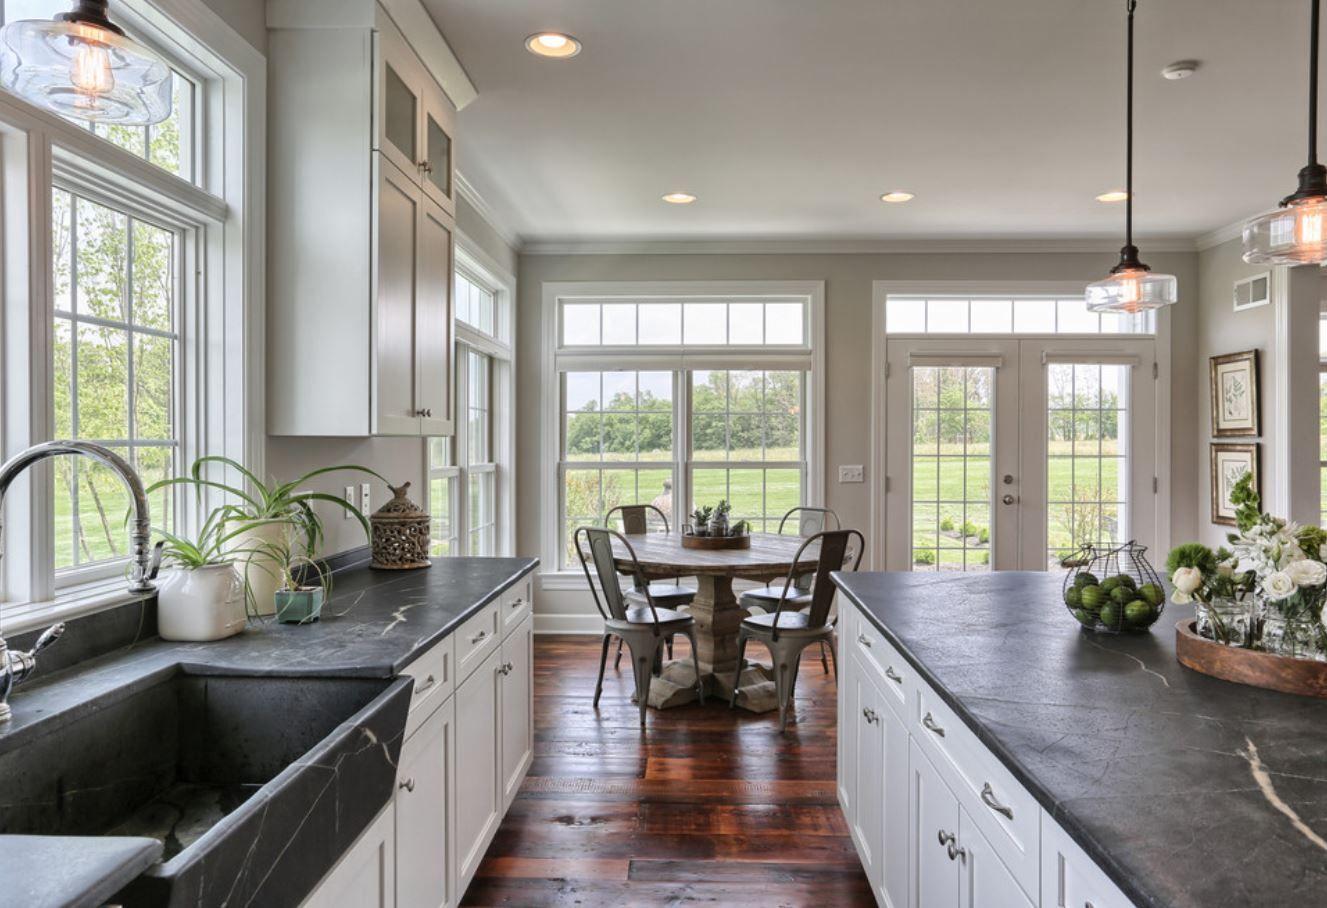 Soapstone Countertops Windows Perfect Diy Countertops Kitchen Remodel Kitchen Black Counter